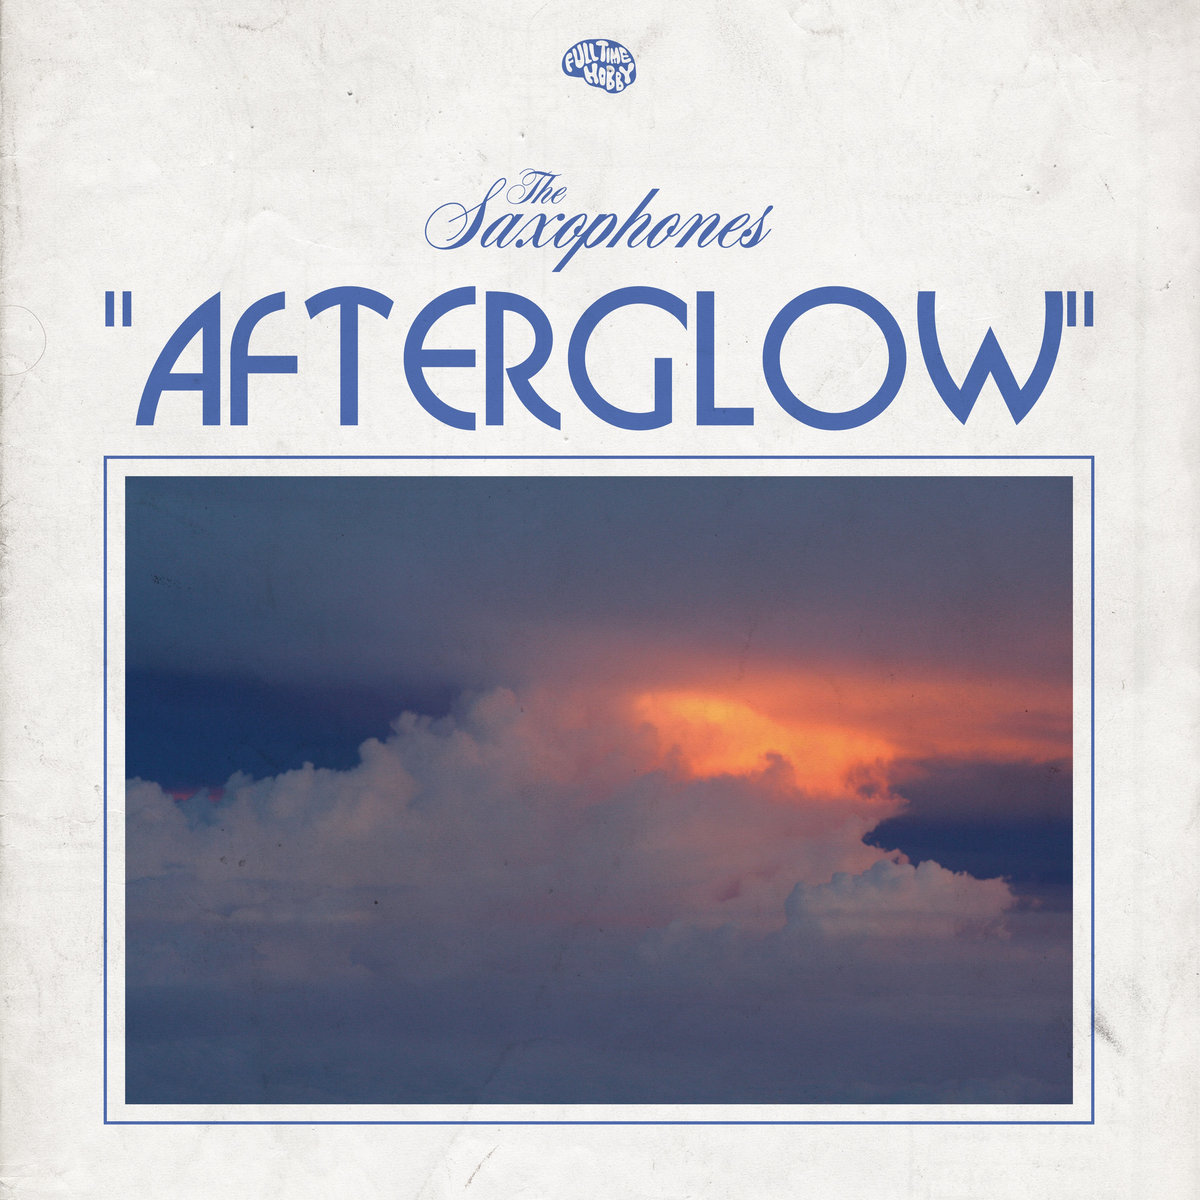 Afterglow | The Saxophones